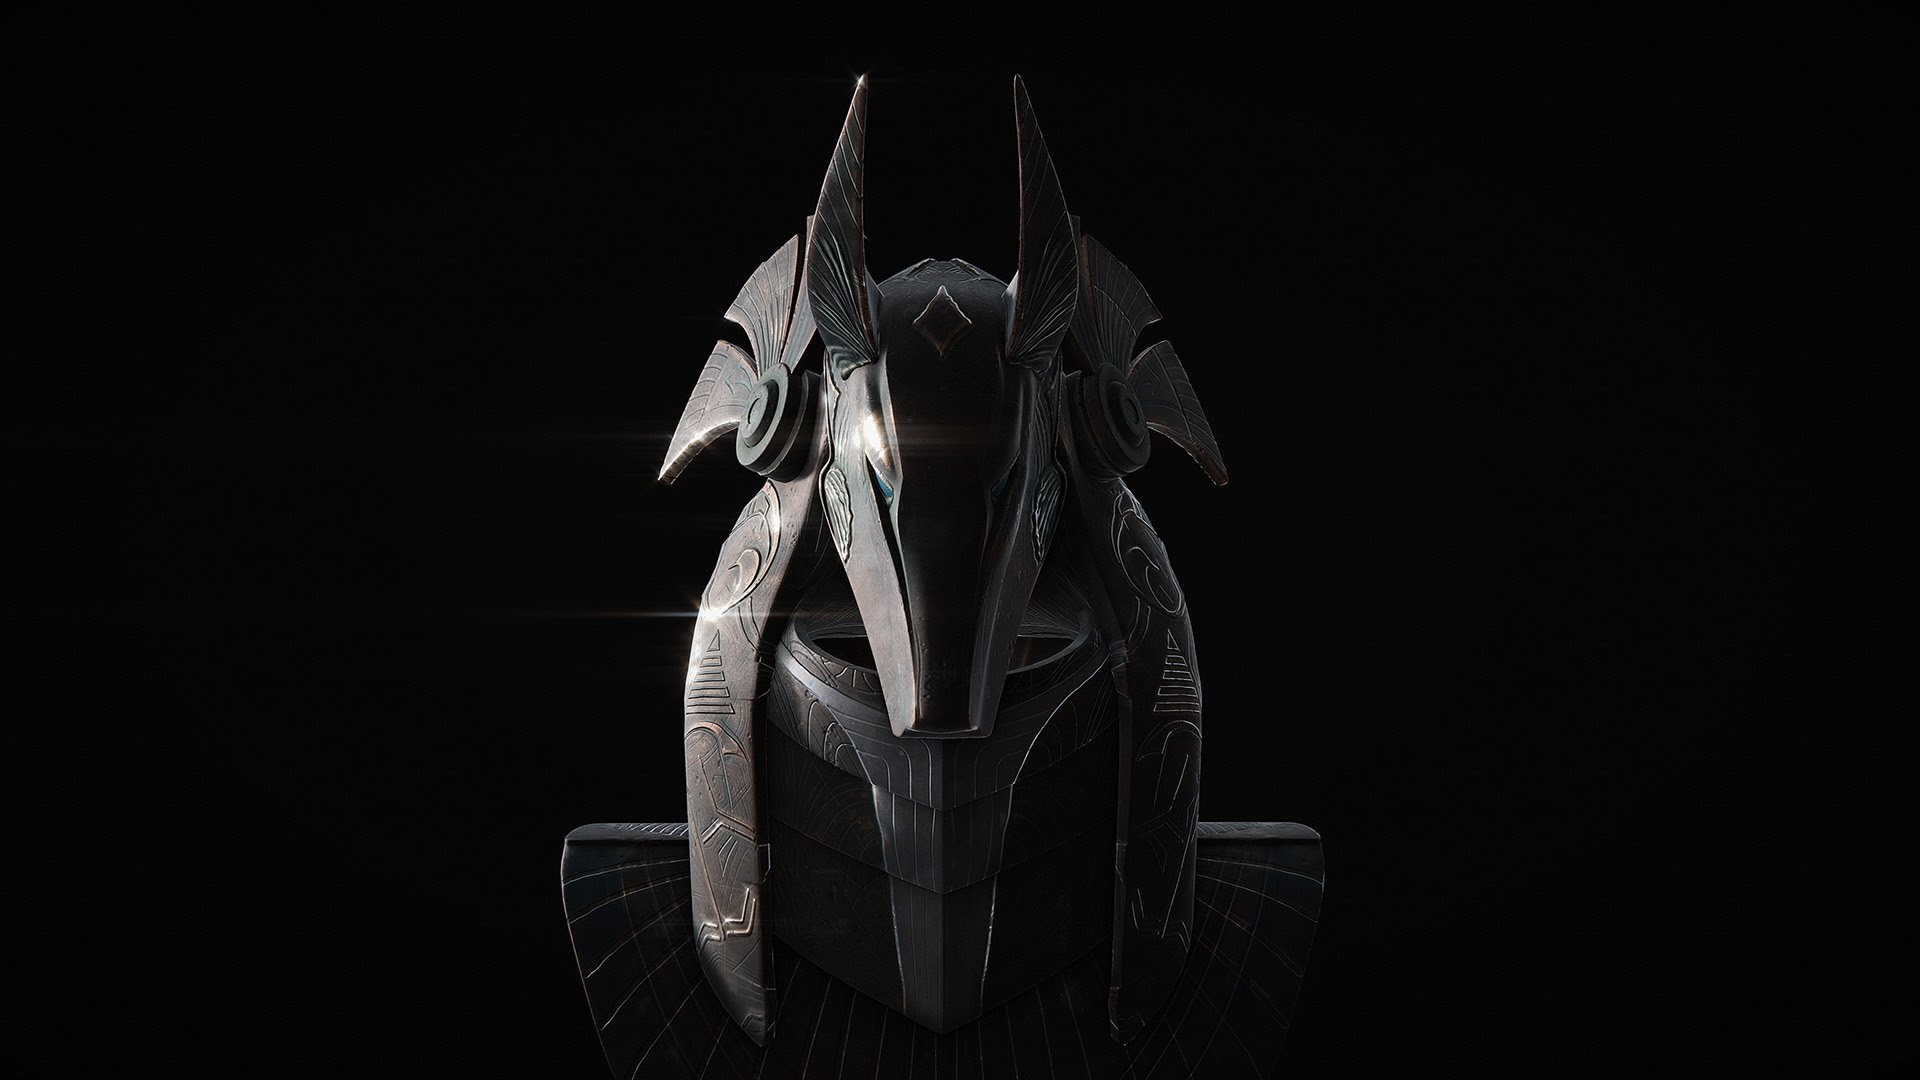 egypt god wolf wallpaper – photo #16. Startgate Anubis Guard Helmet 3D Art  Project – YouTube